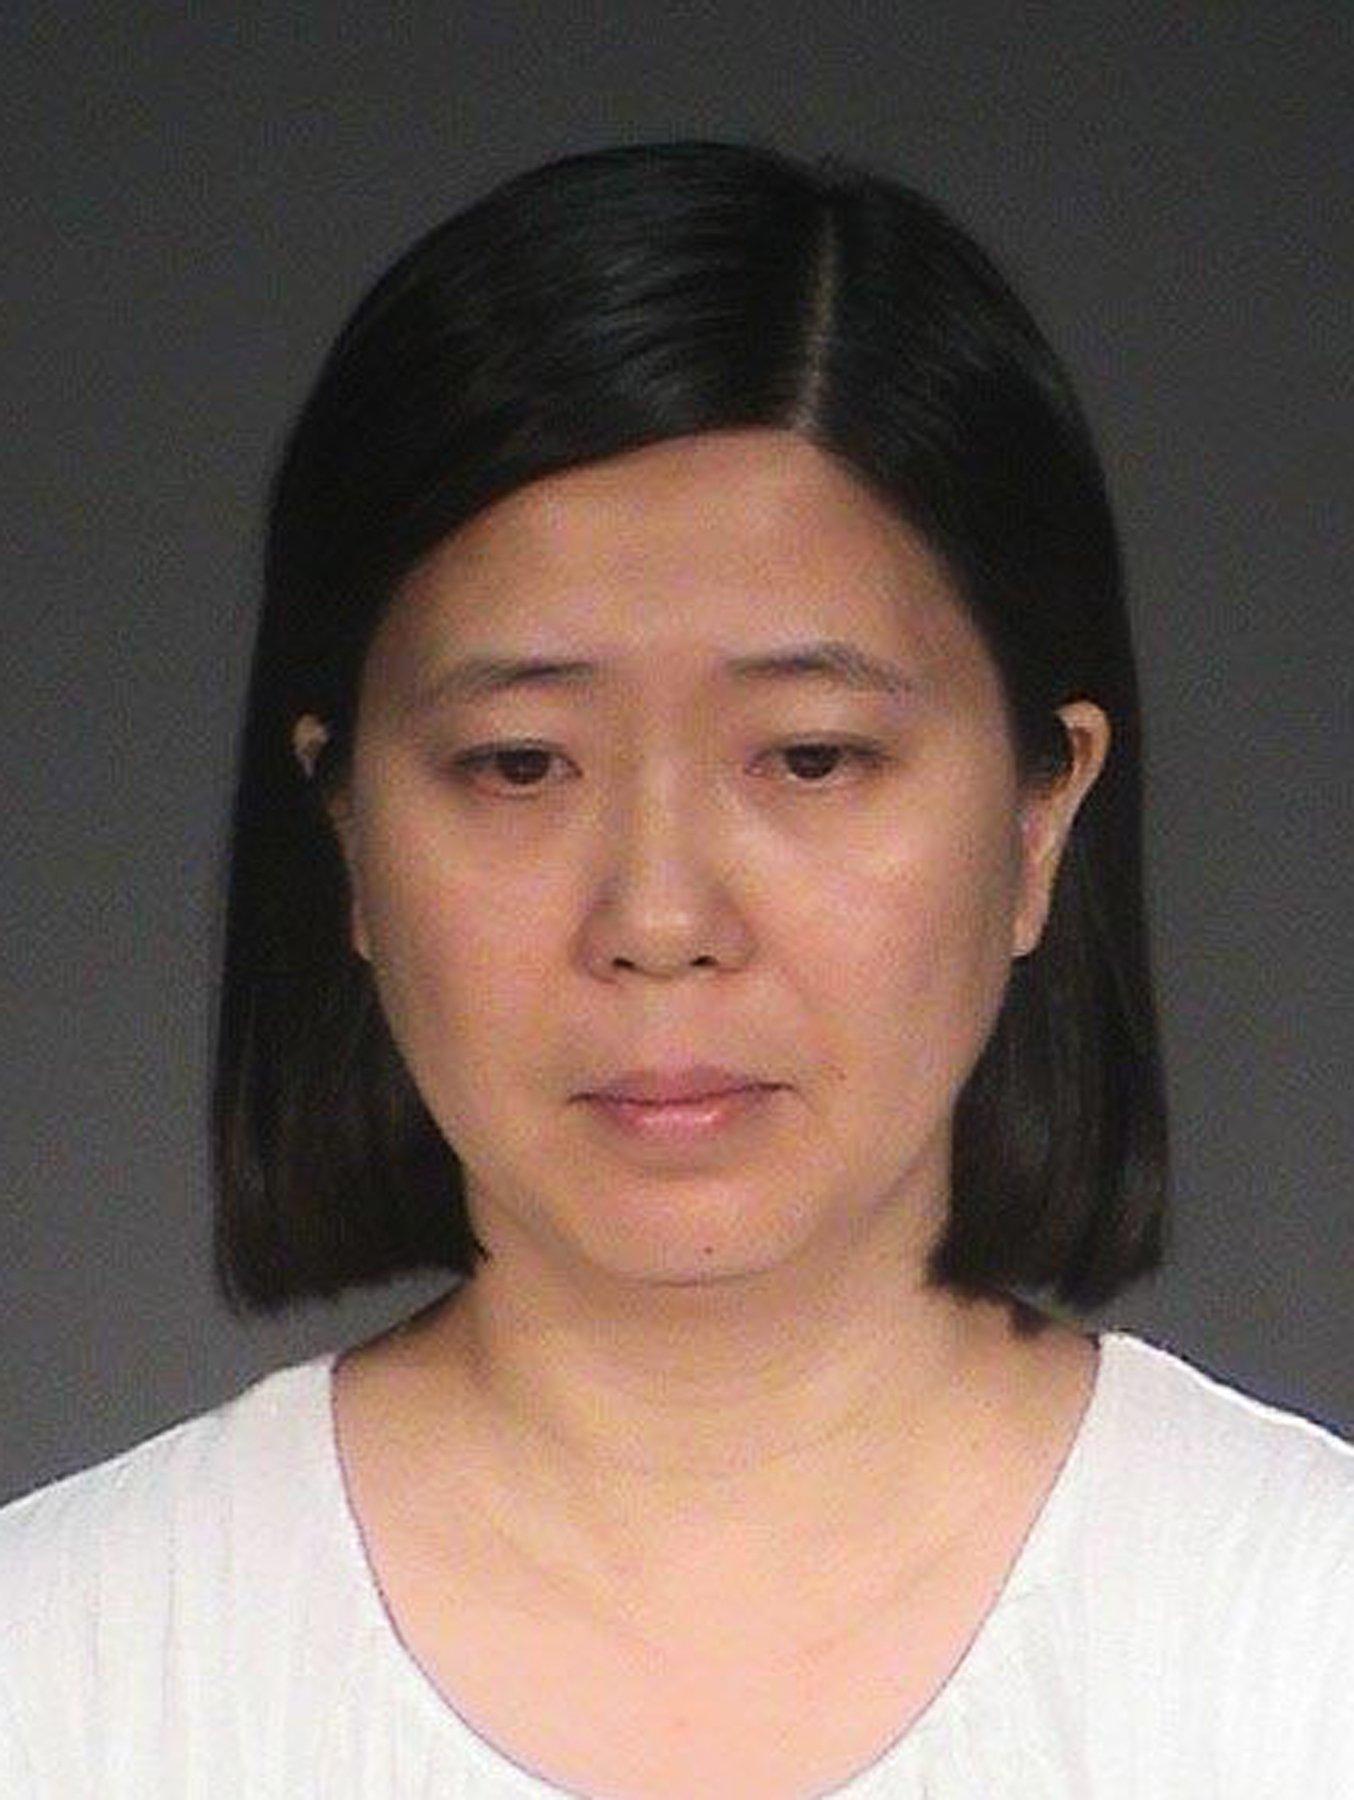 Prosecutors: Woman brought to US as nanny treated like slave